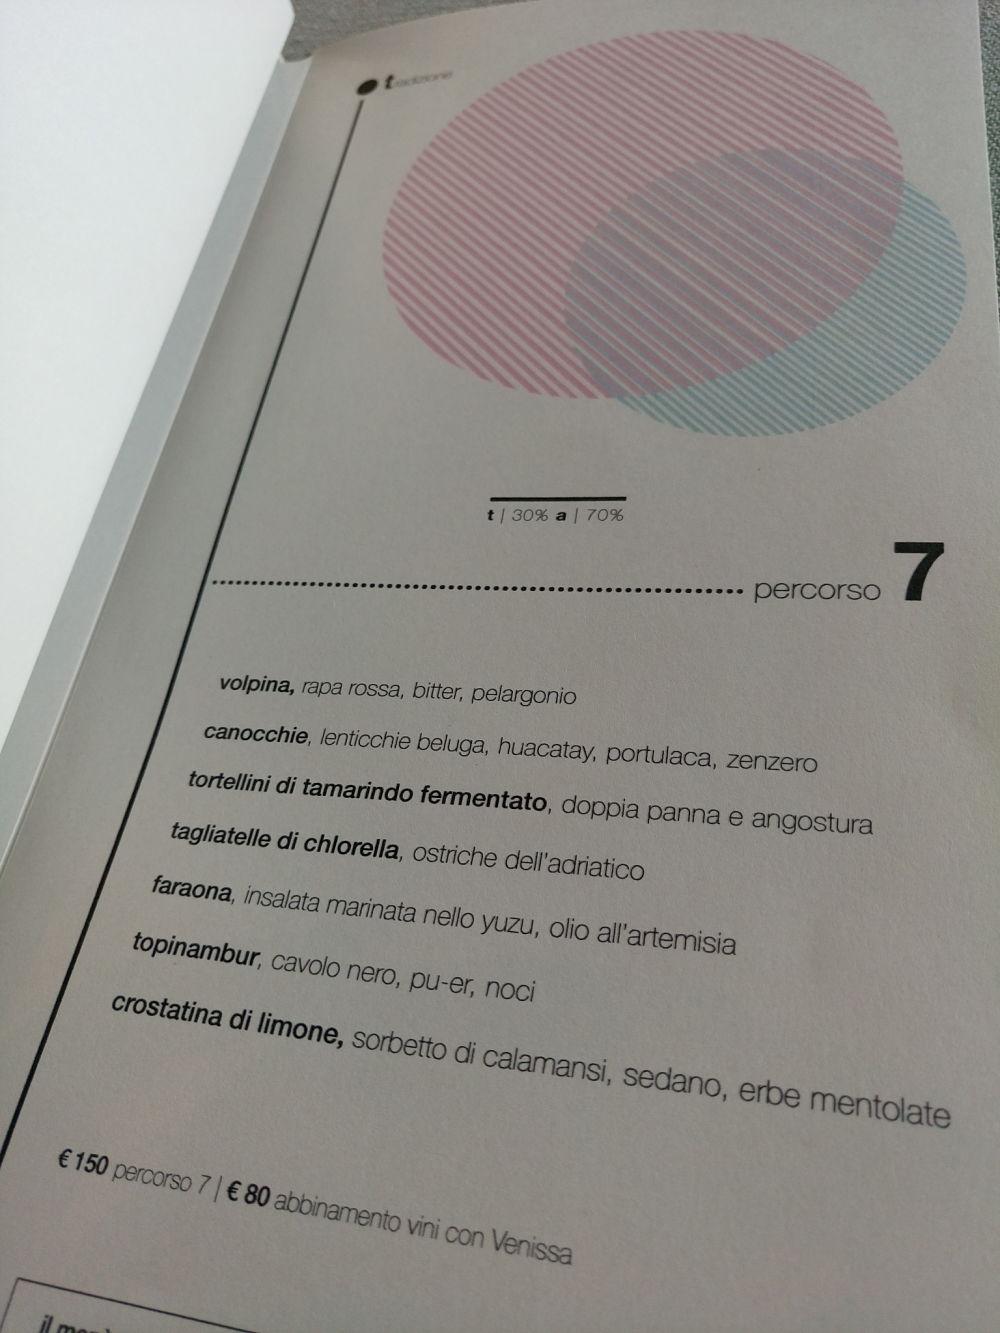 Venissa menu' - Francesco Brutto, Chiara Pavan